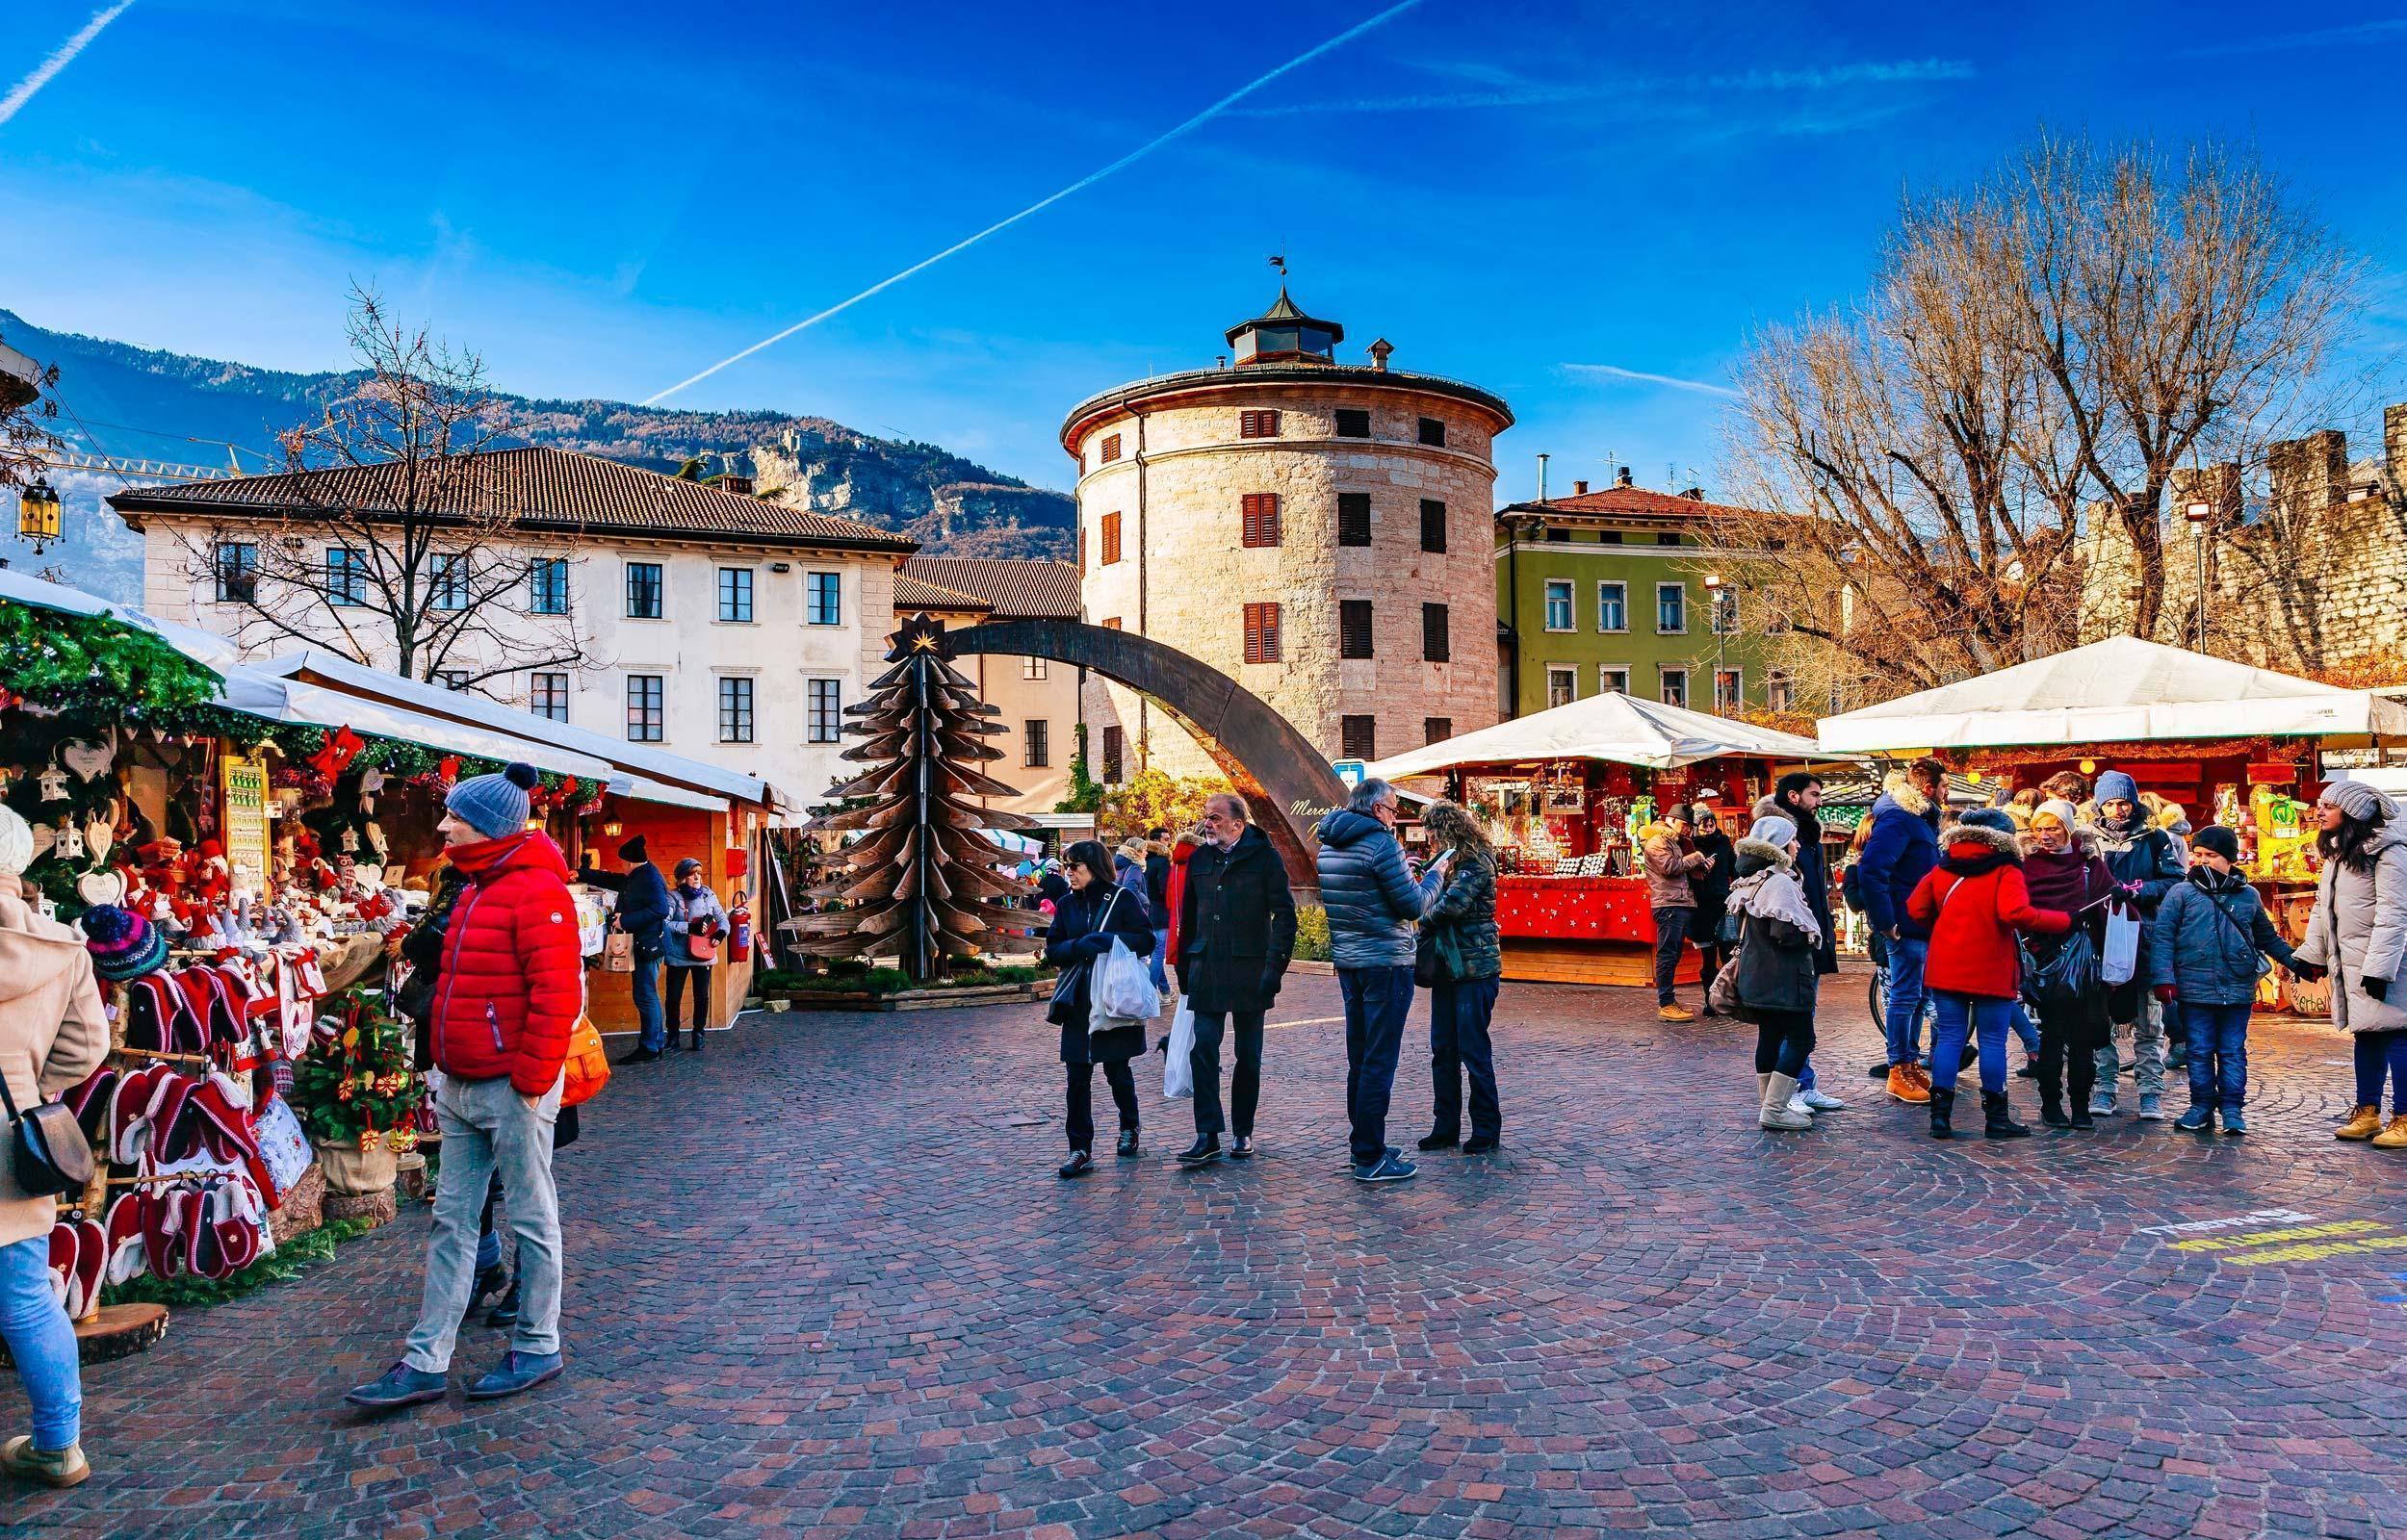 Mercatini di Natale in Valsugana: Levico, Trento, Rovereto